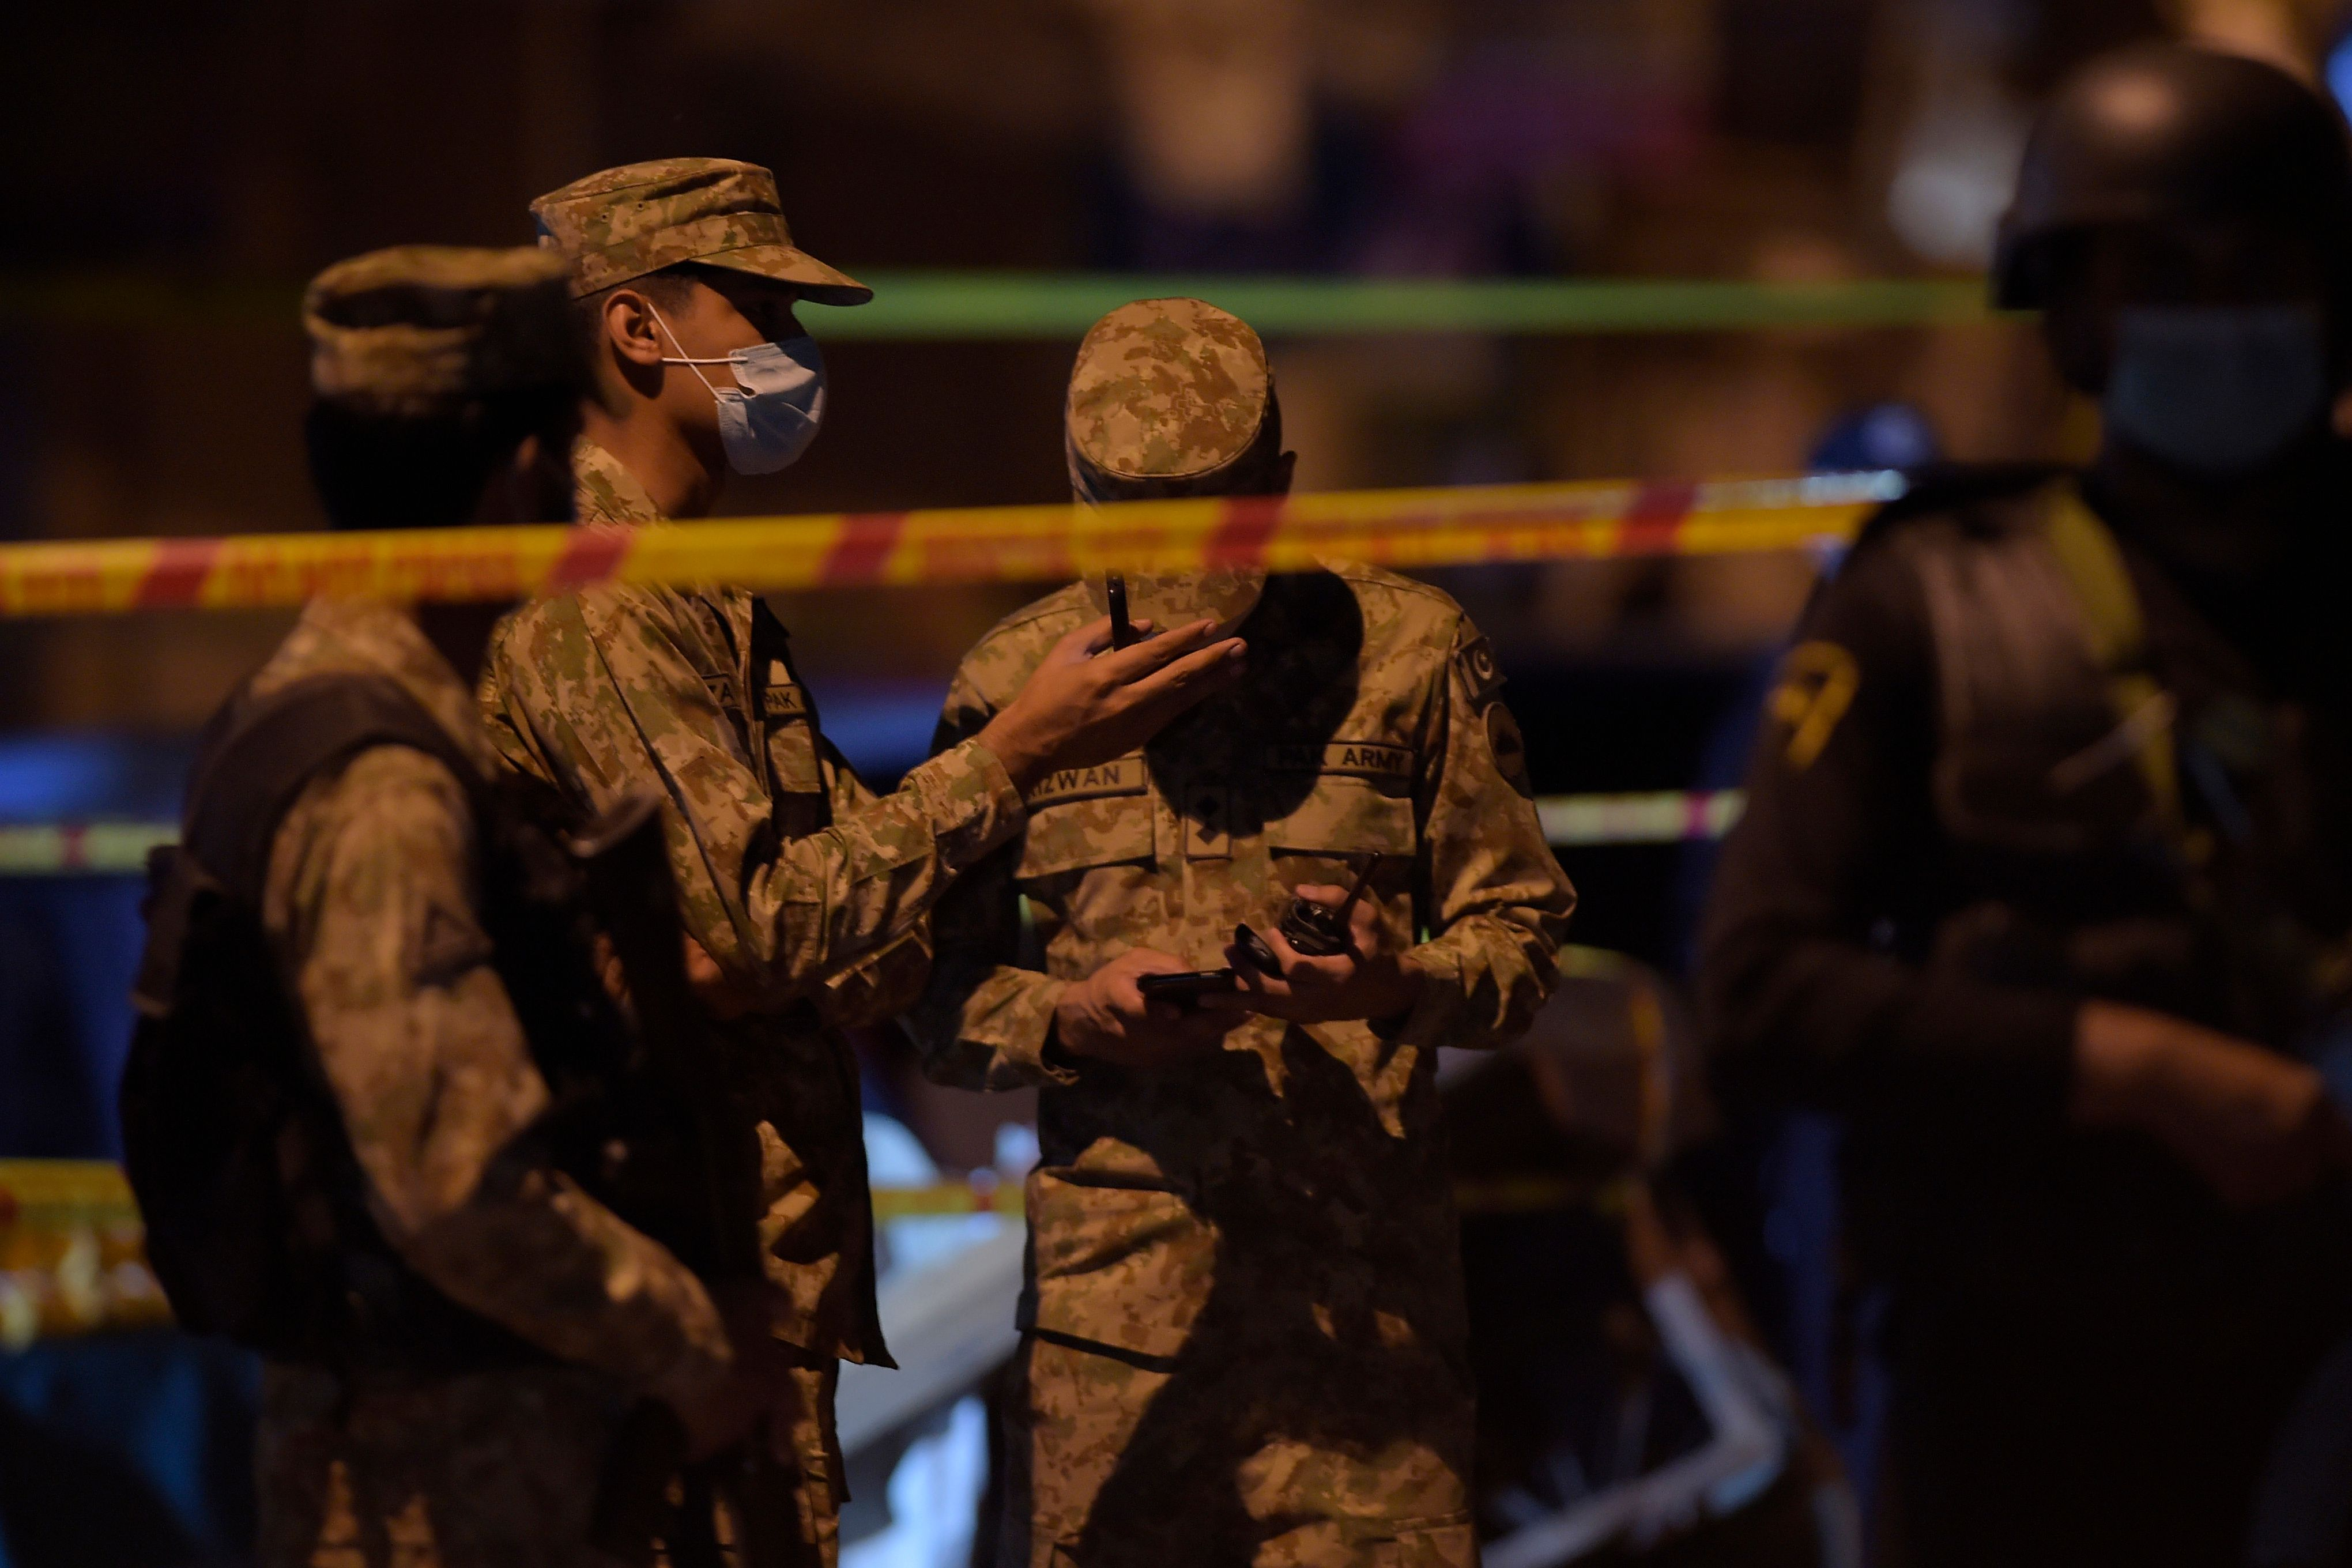 At least one killed, 15 injured in explosion in market in Pakistan's  Rawalpindi | Deccan Herald